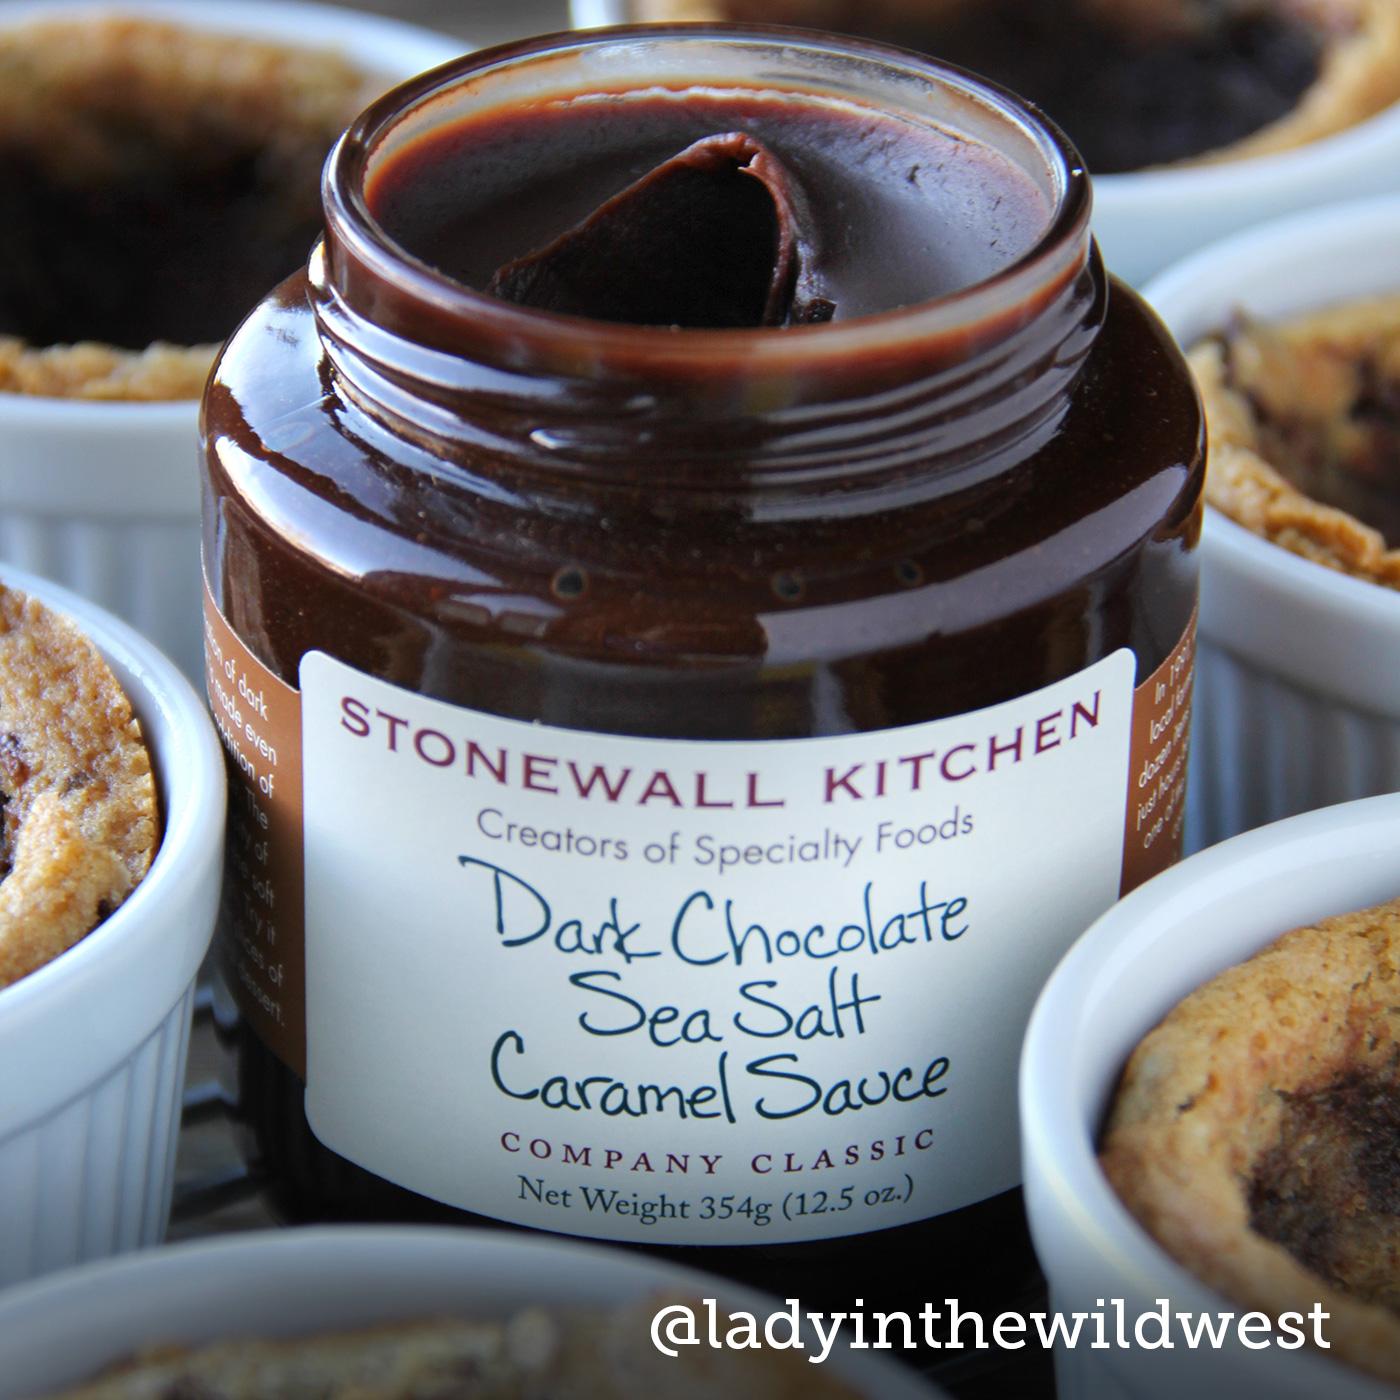 stonewall kitchen dark chocolate sea salt caramel sauce wooden signs for